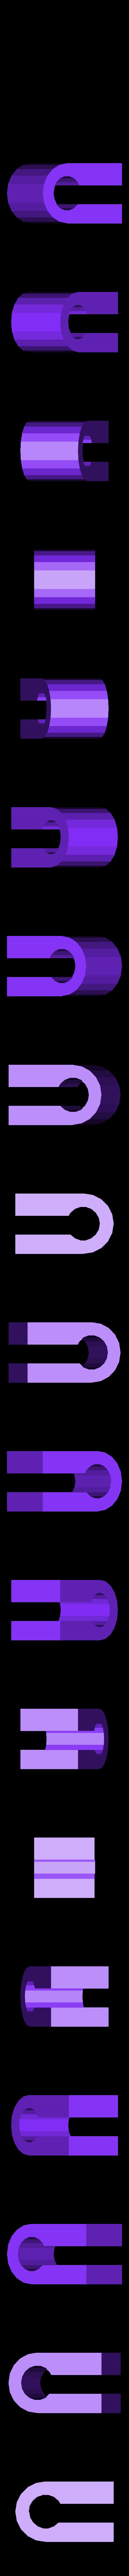 bar-clamp.stl Télécharger fichier STL gratuit Bobine • Objet à imprimer en 3D, billythemighty3Dprinter